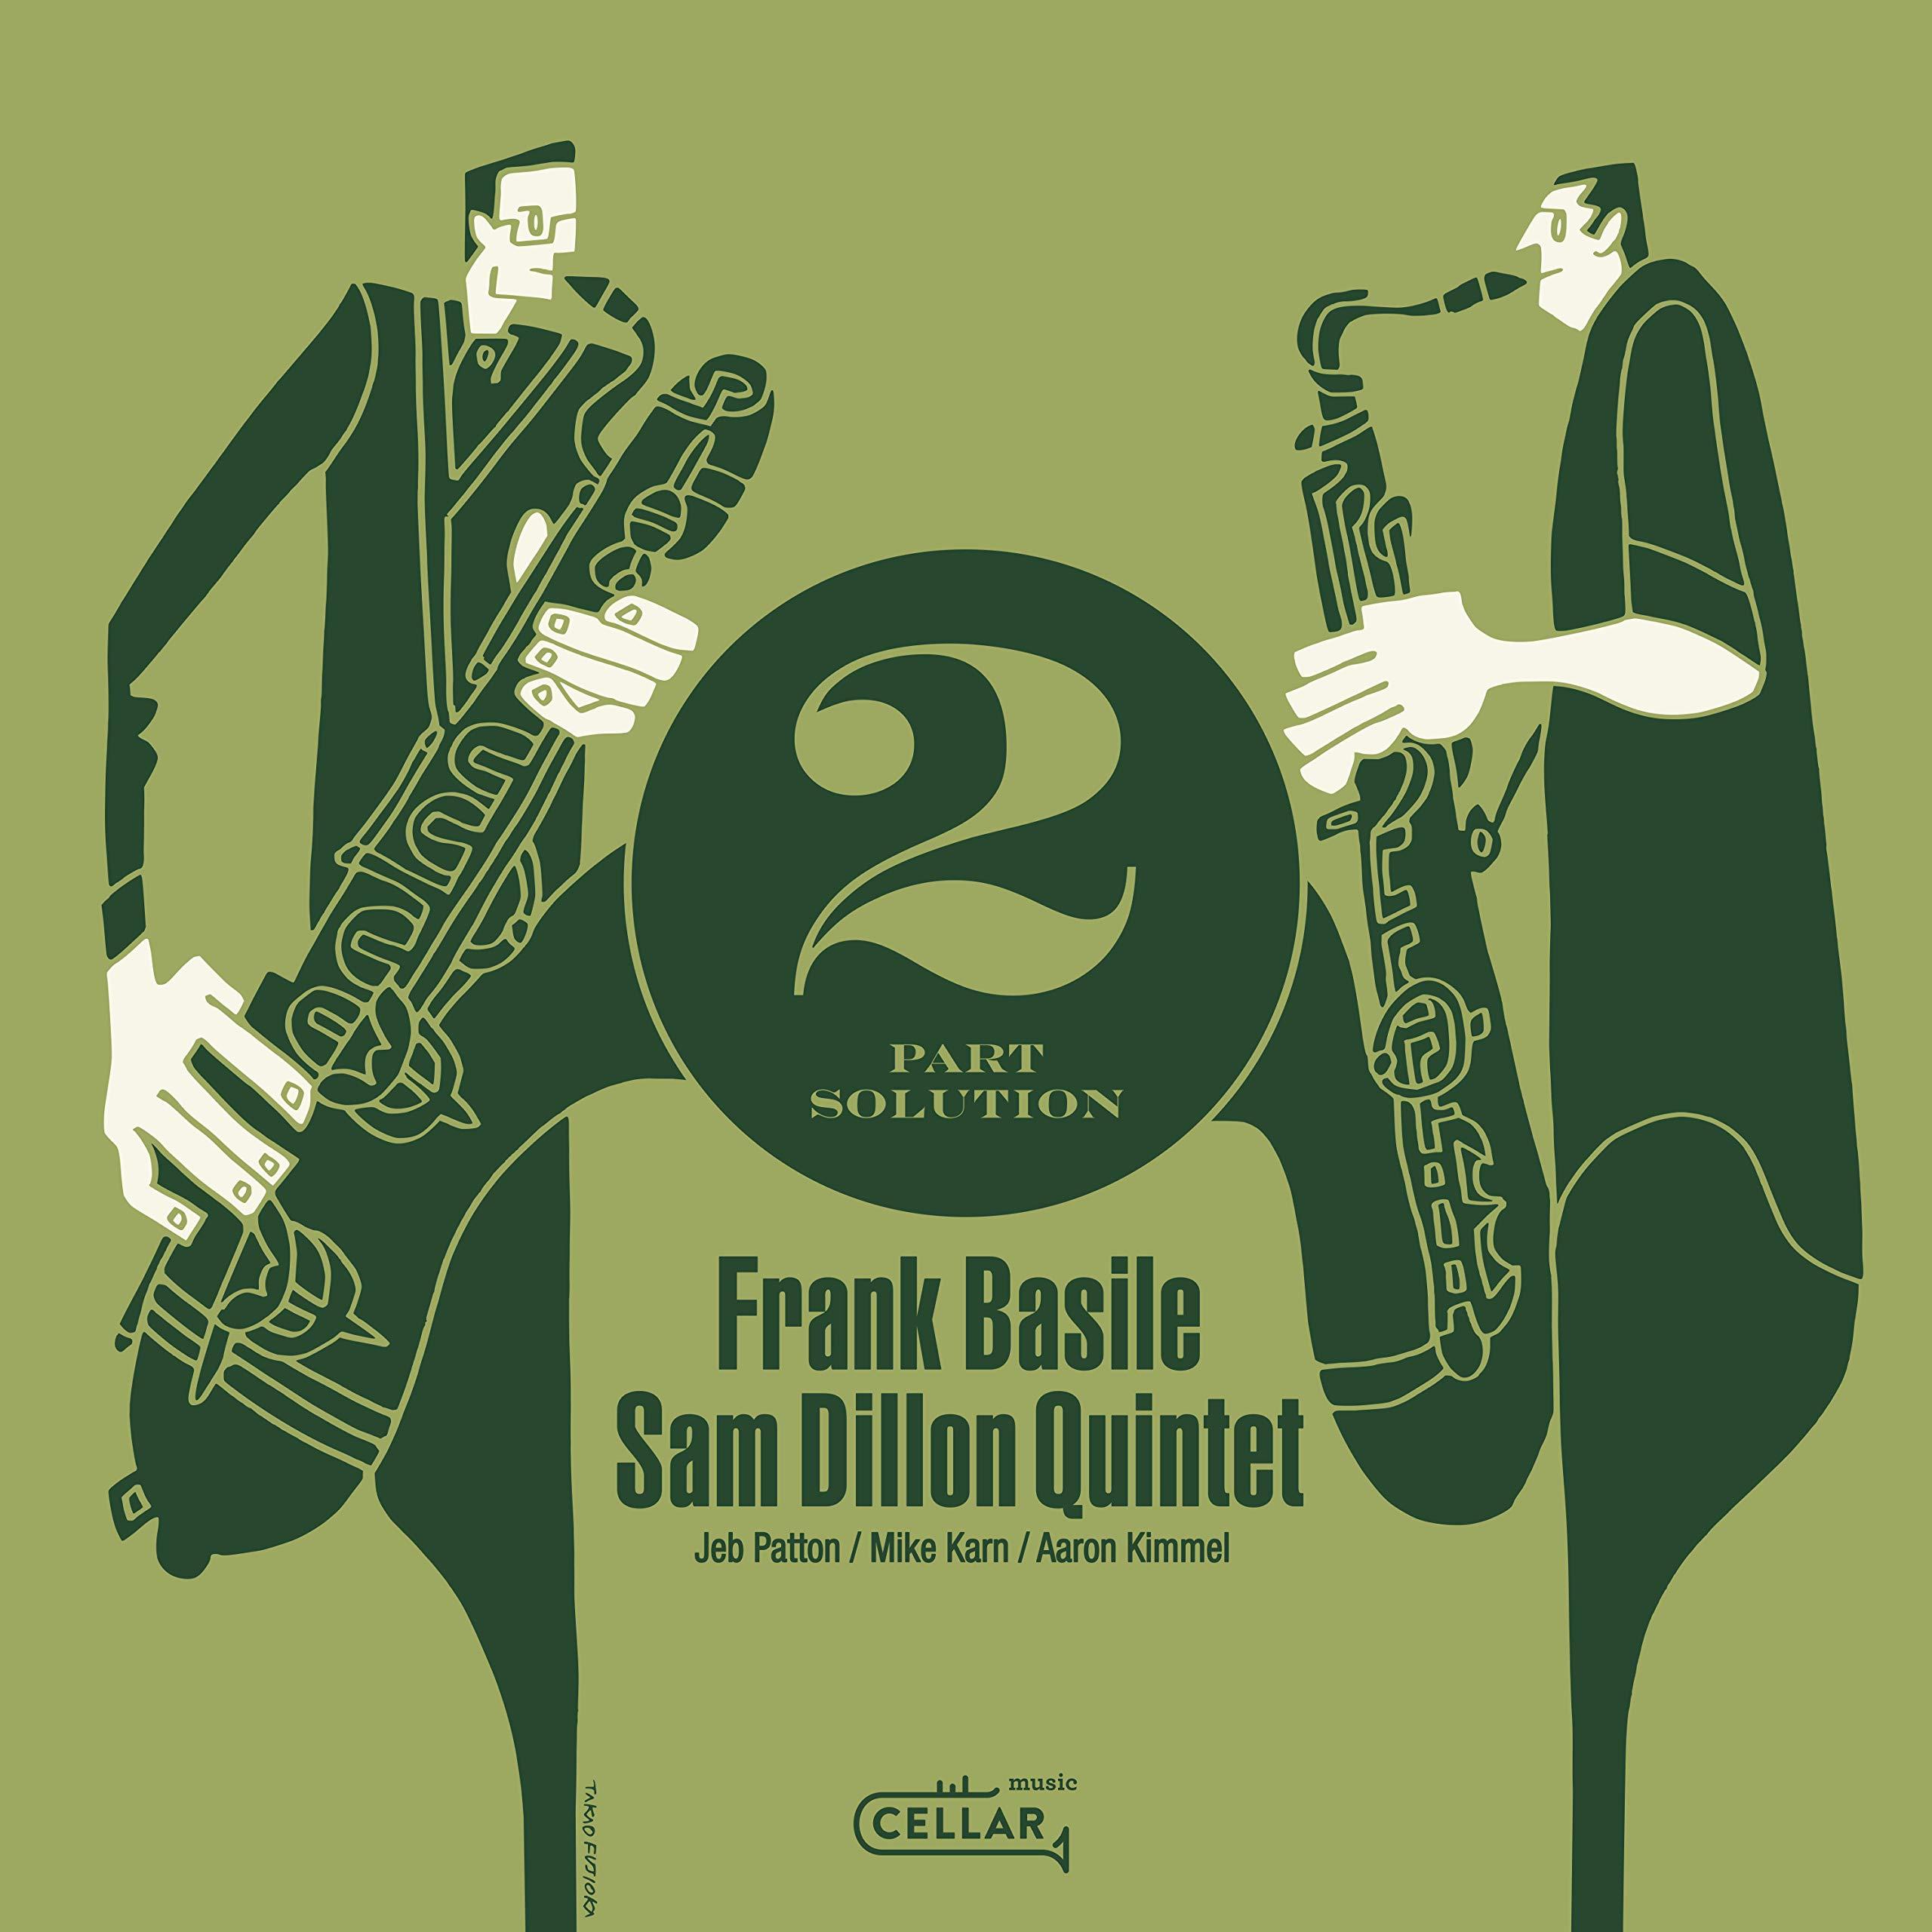 Frank Basile Sam Dillon Quintet - Two Part Solution (2020) [FLAC] Download